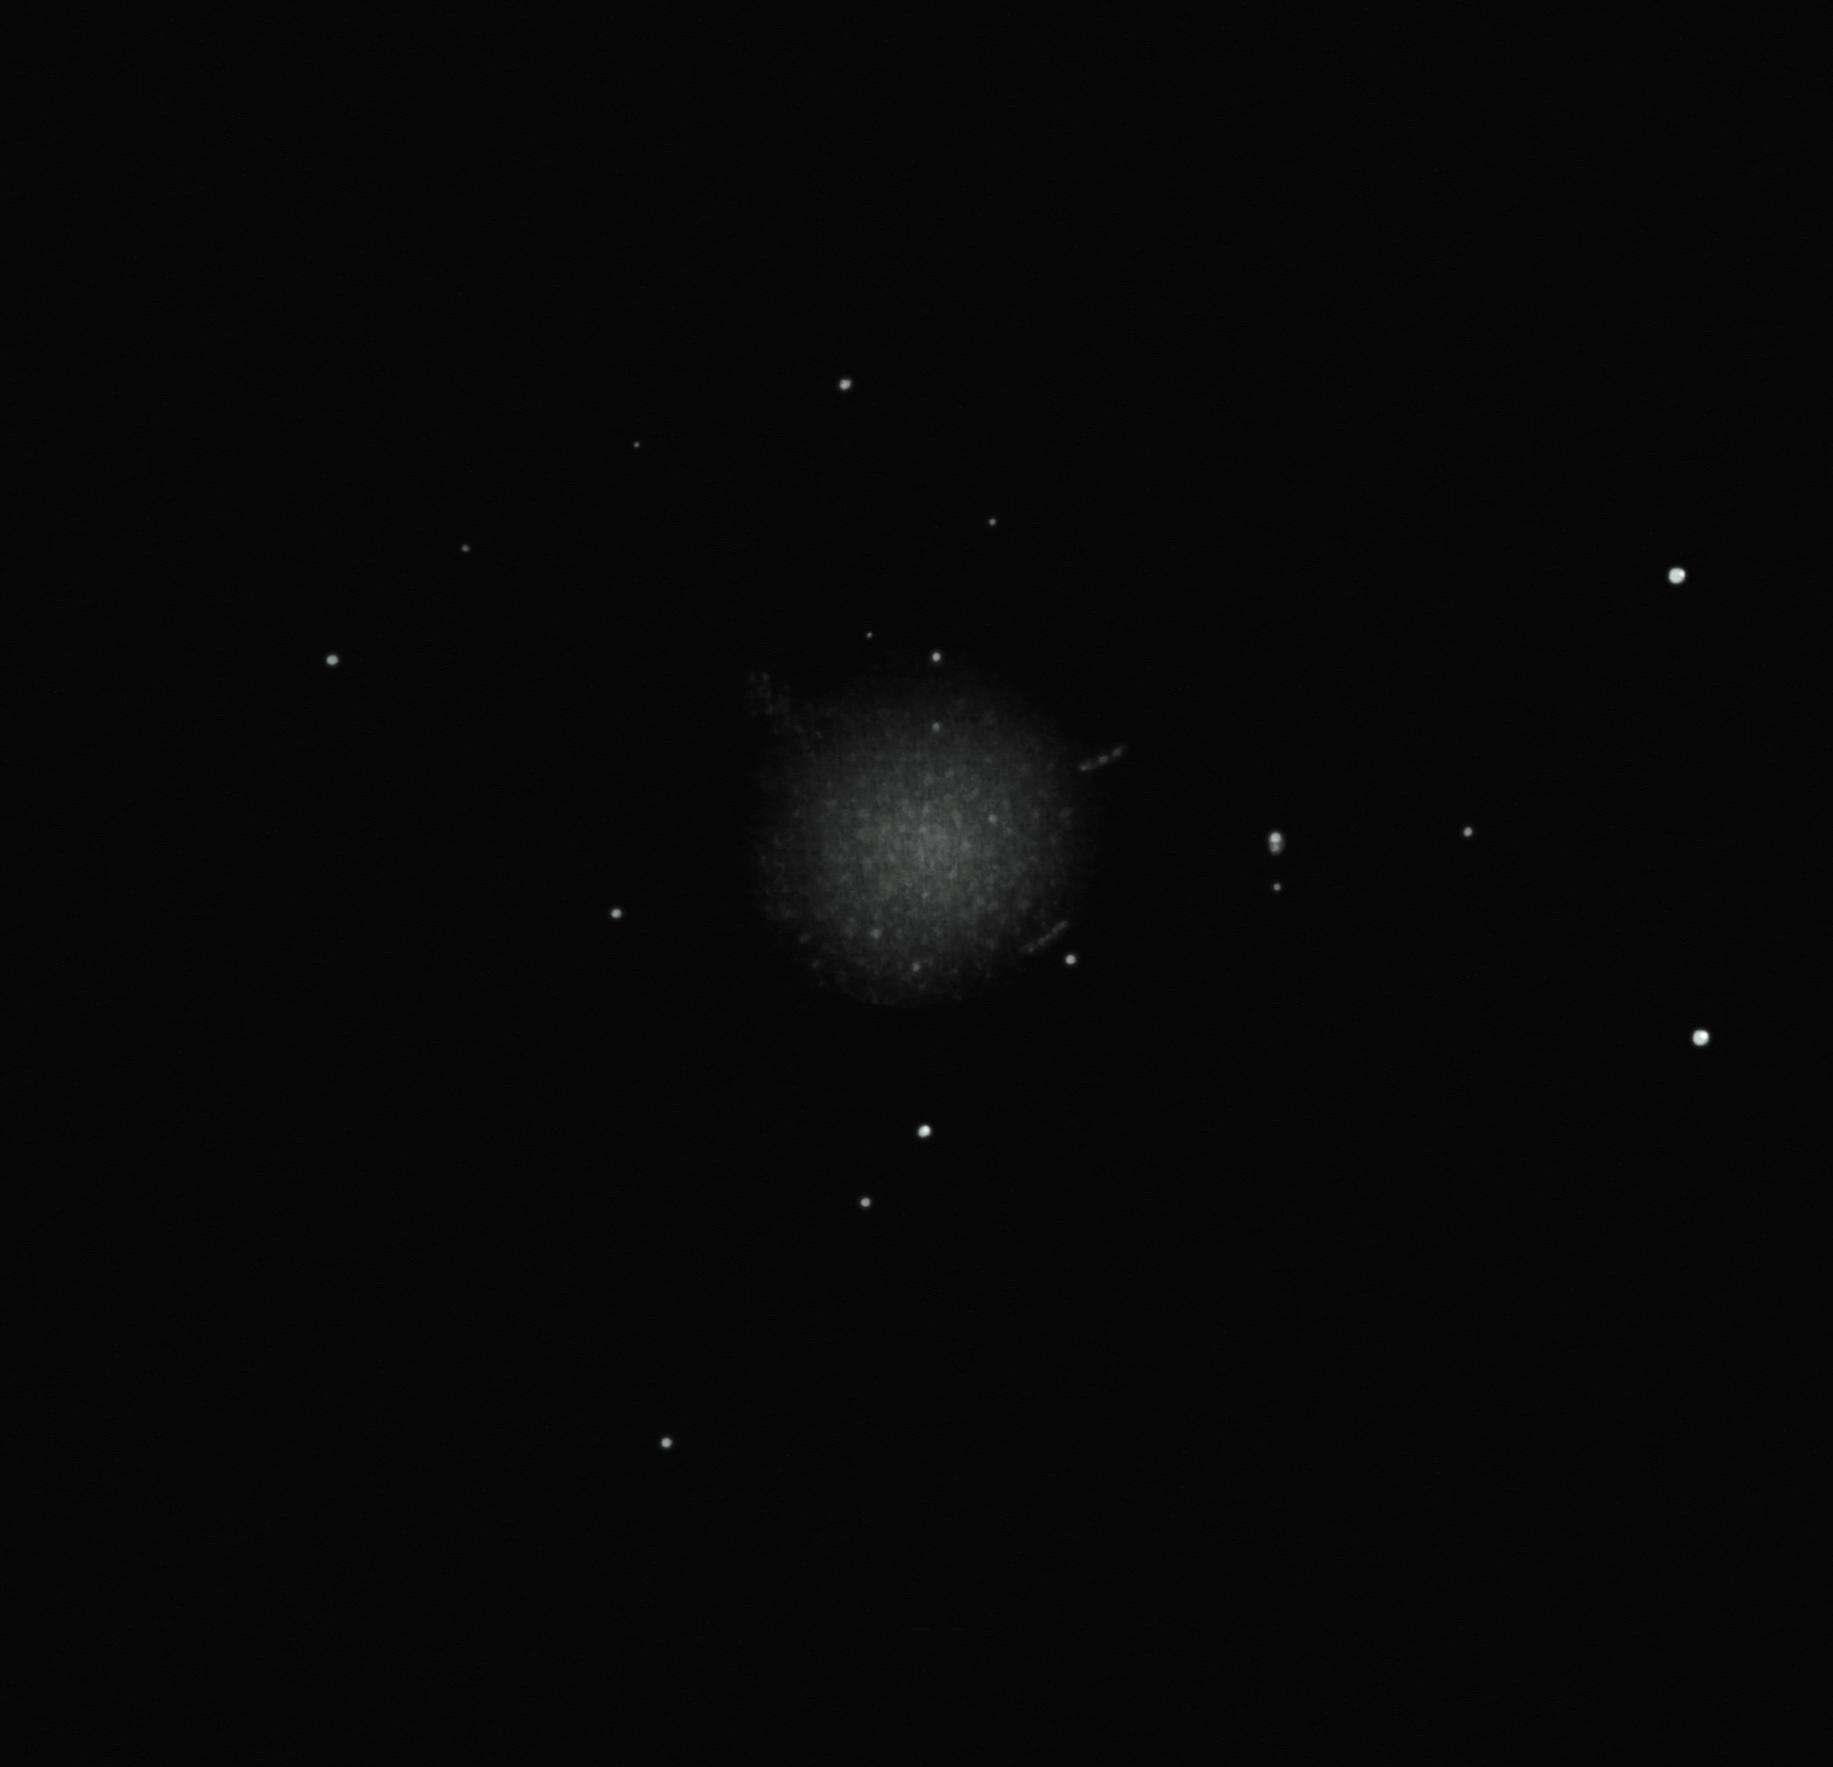 M14 globular cluster